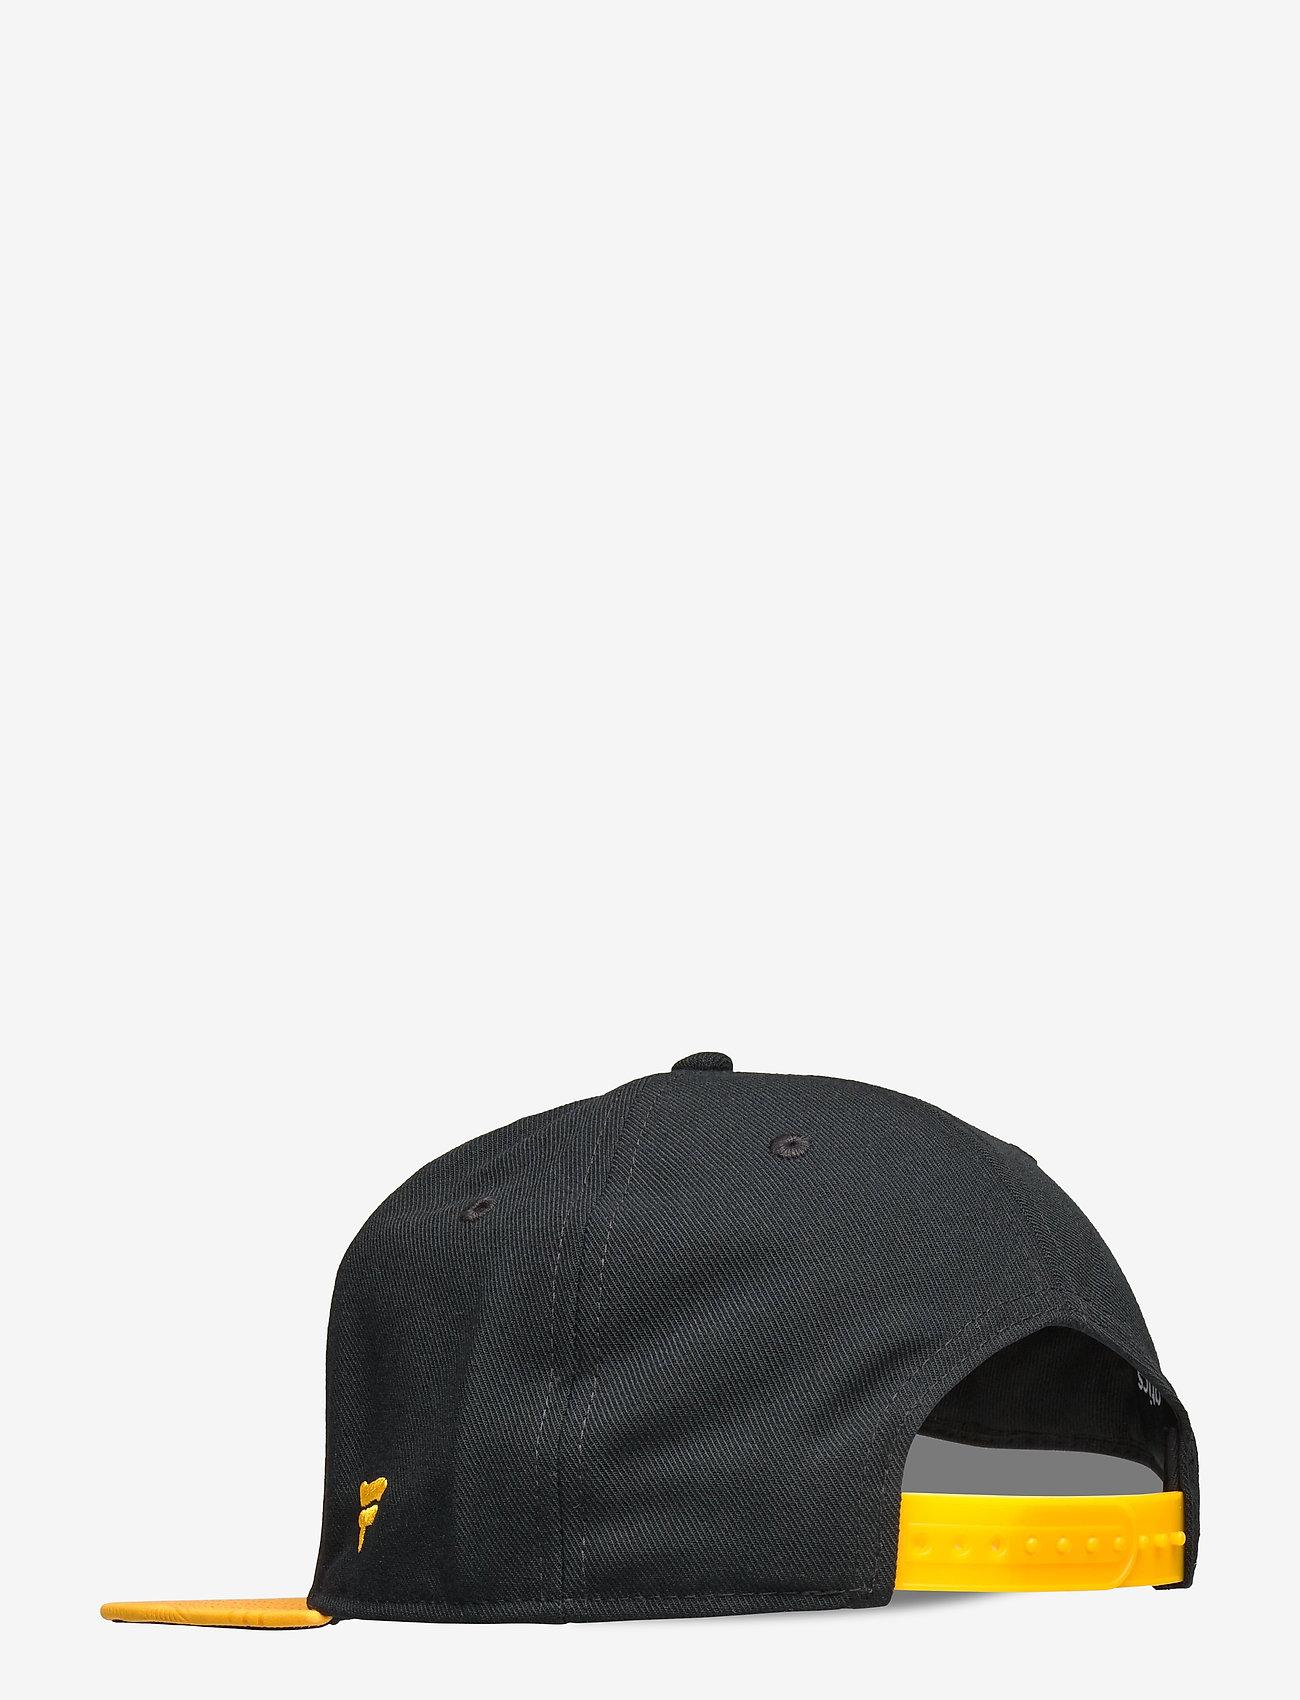 Fanatics - Pittsburgh Penguins Iconic Defender Snapback Cap - caps - black/yellow gold - 1